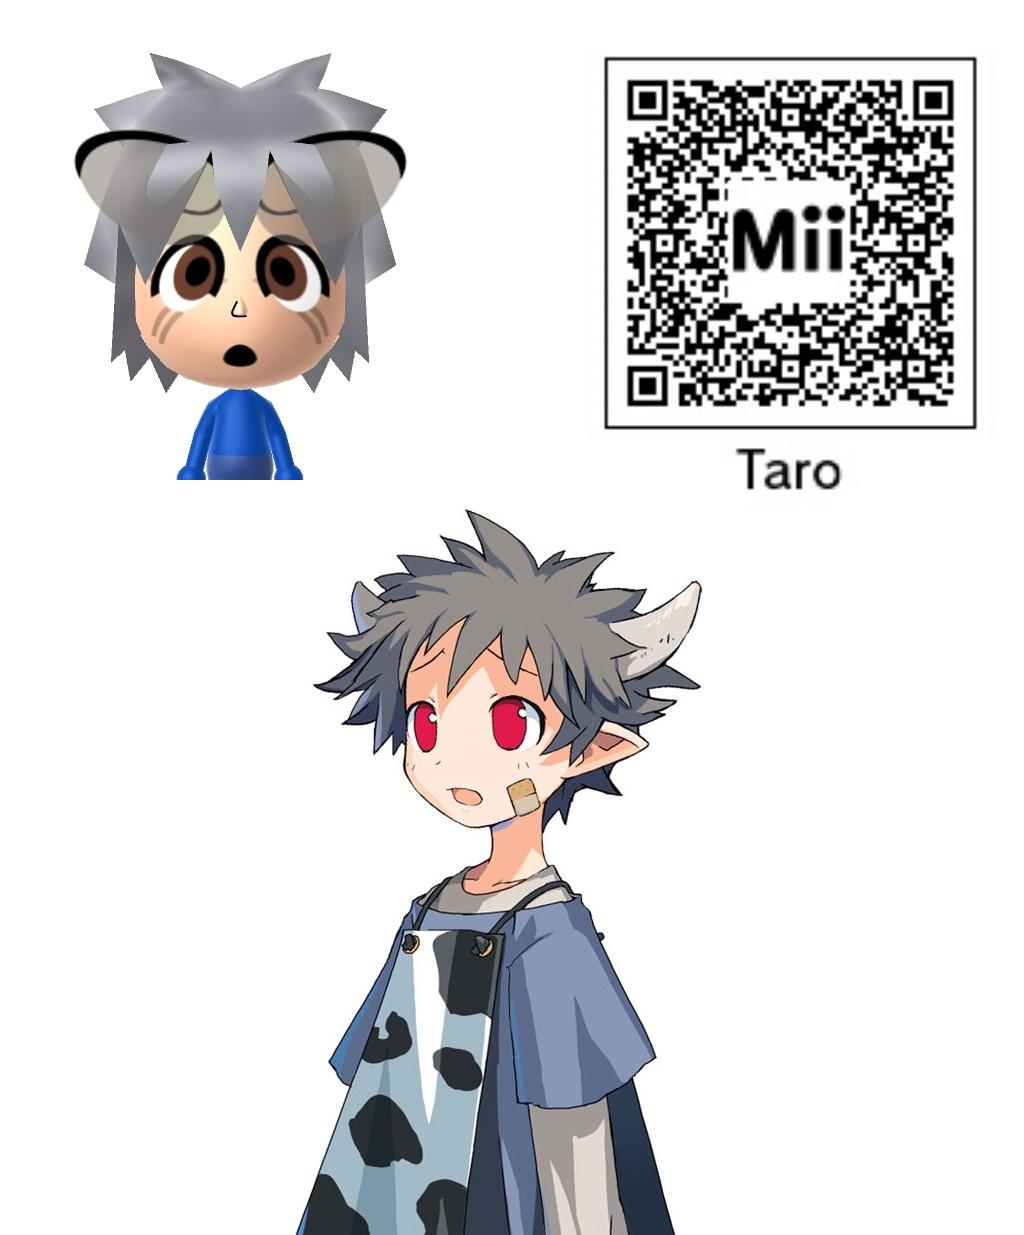 Anime Mii Codes by izzy5605 on DeviantArt